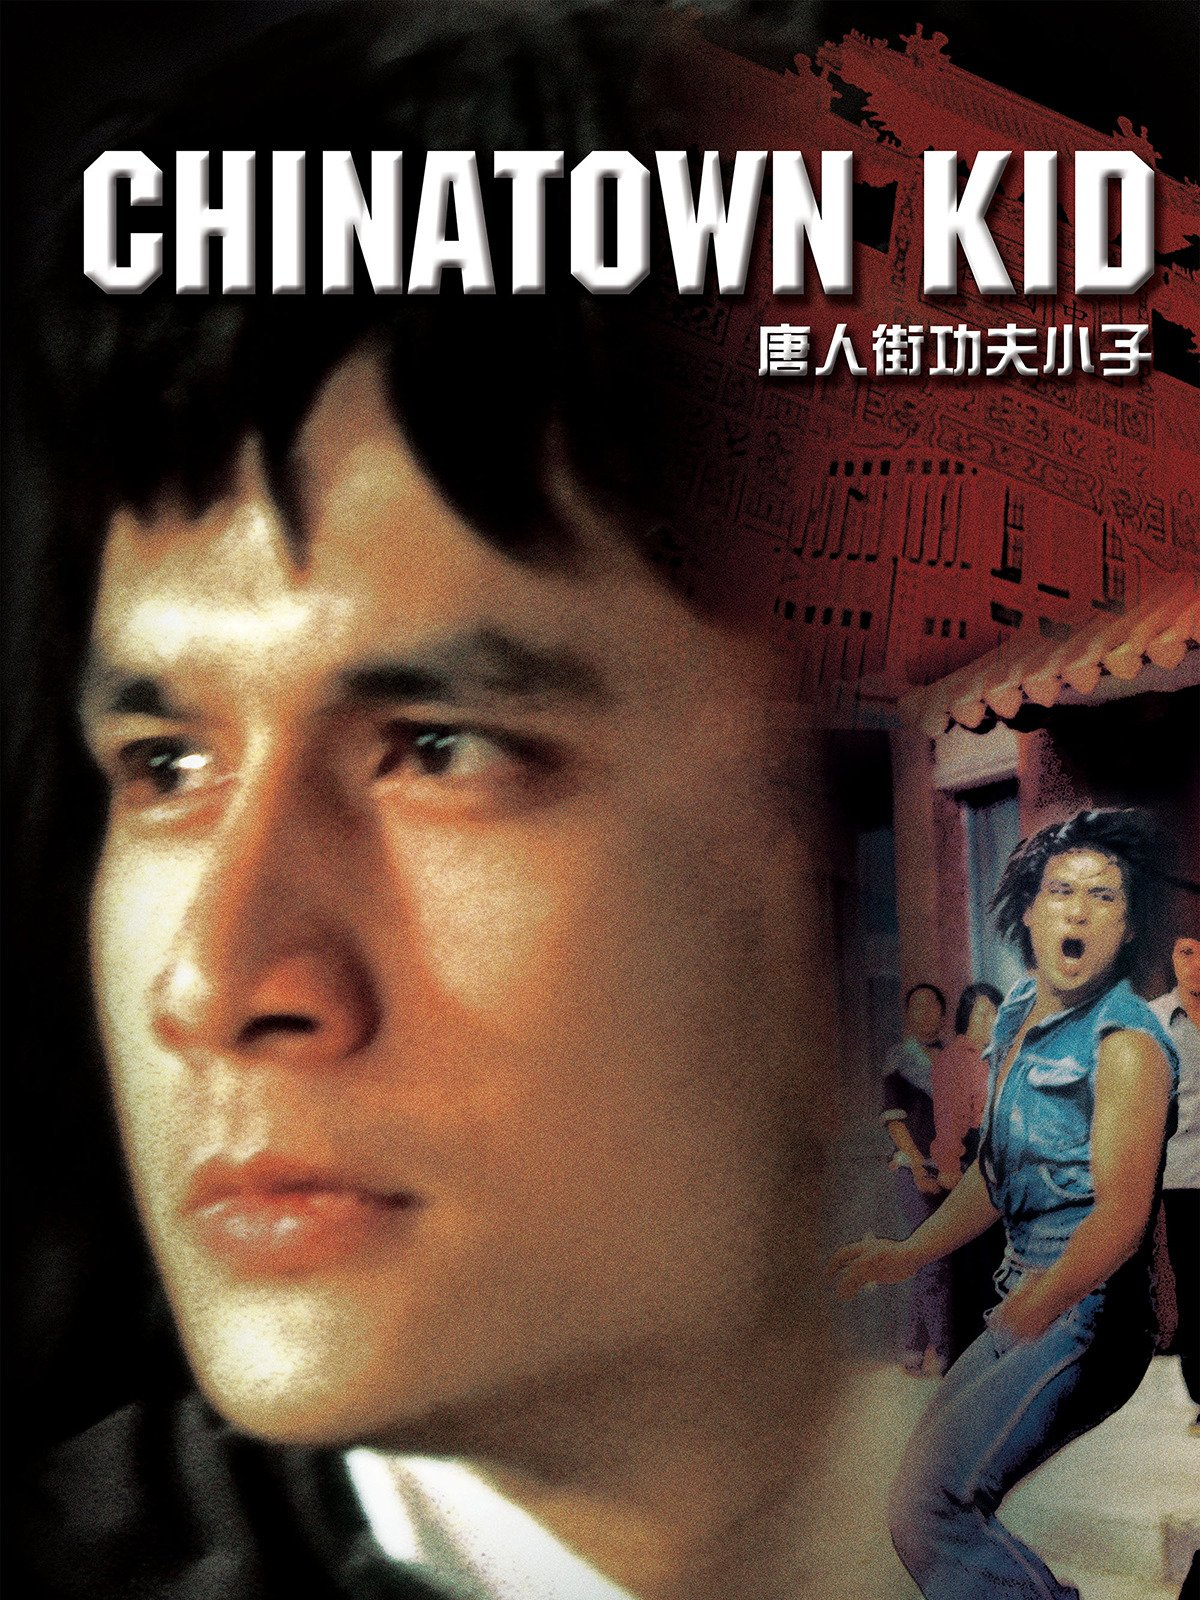 Chinatown Kid on Amazon Prime Video UK